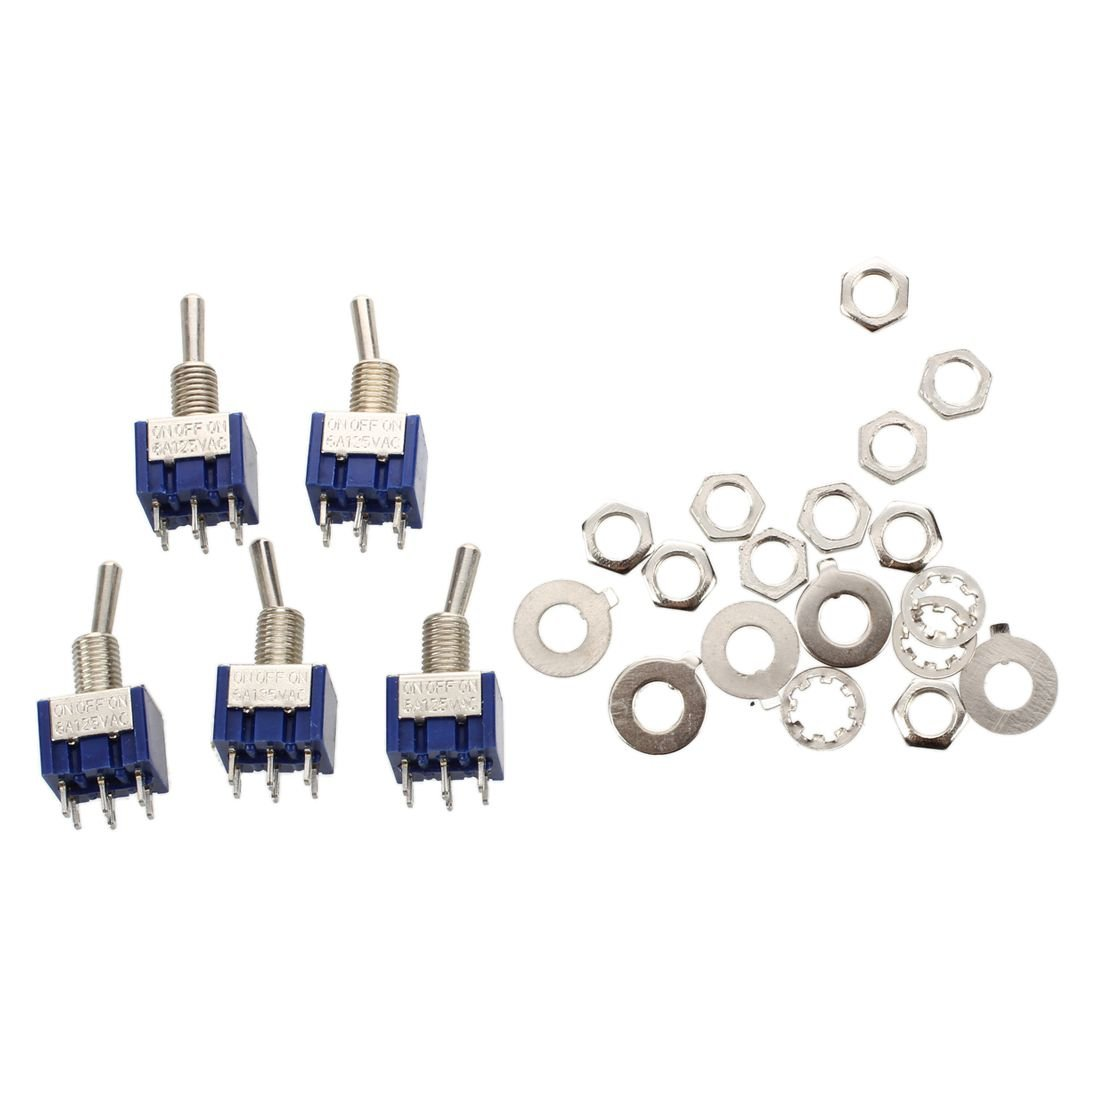 SODIAL(R) 5pzs Mini Interruptor de palanca miniatura ENCENDIDO -APAGADO - ENCENDIDO 2P2T DPDT de 3 posiciones